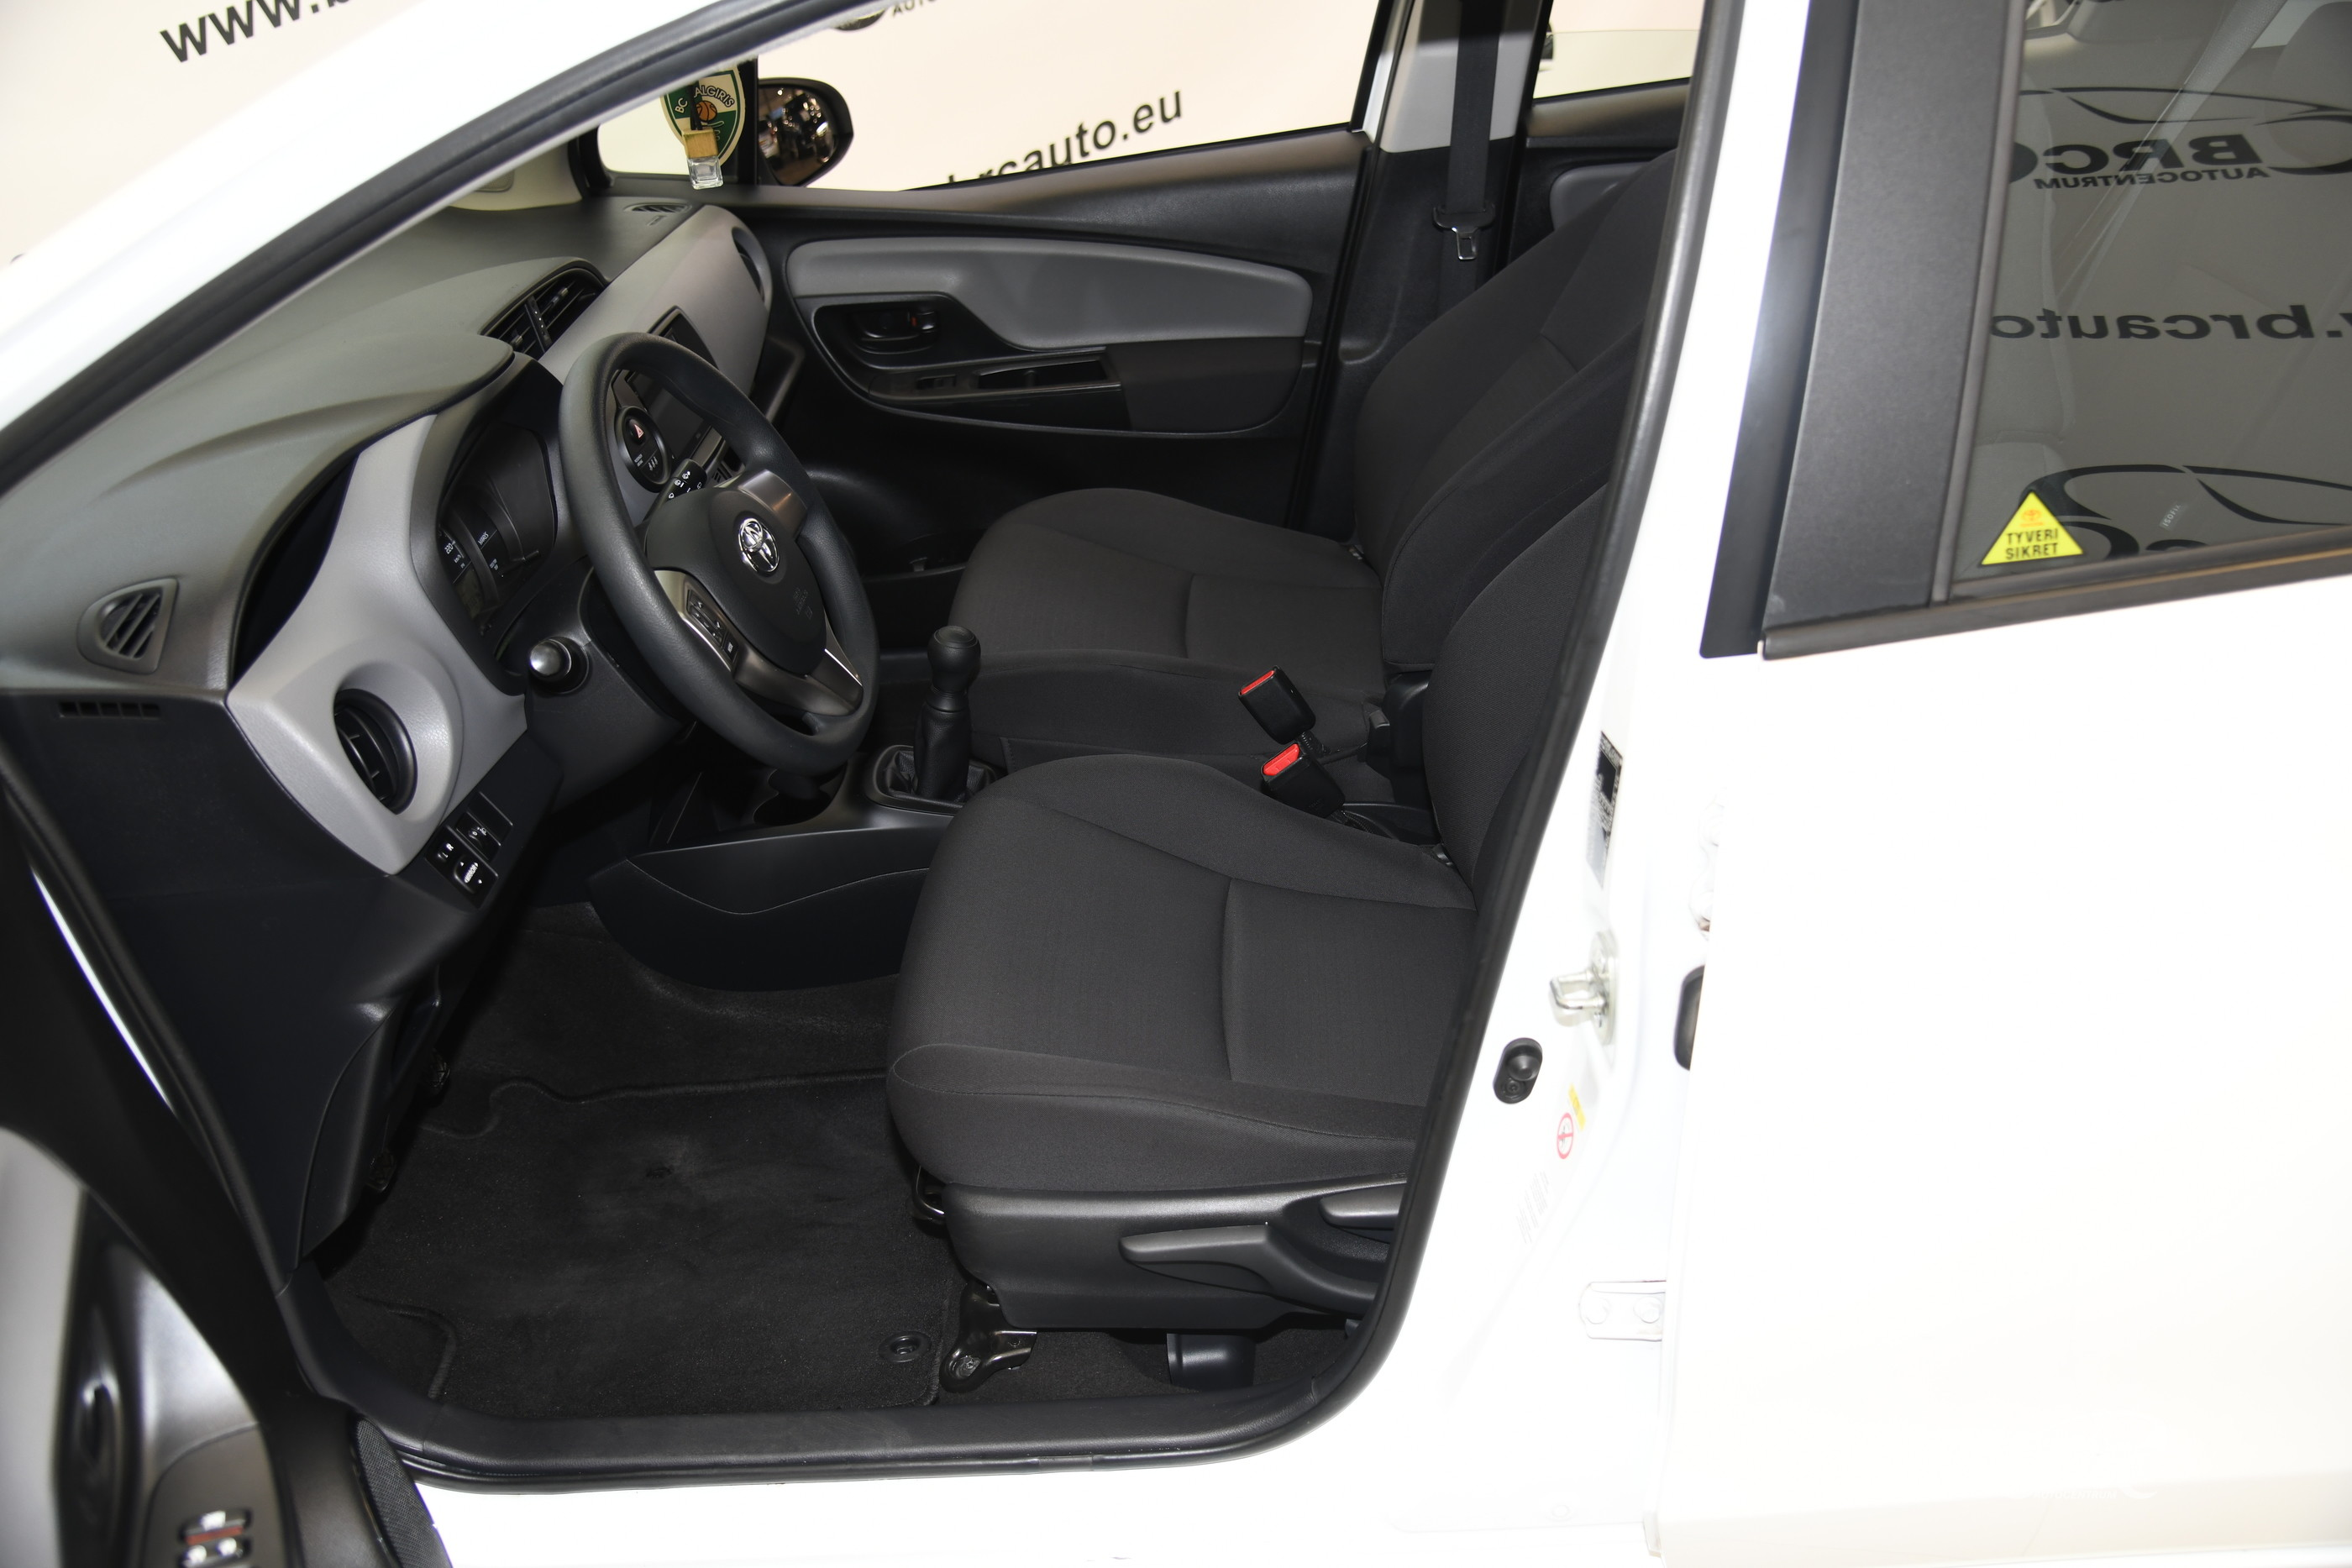 Toyota Yaris 1.0i